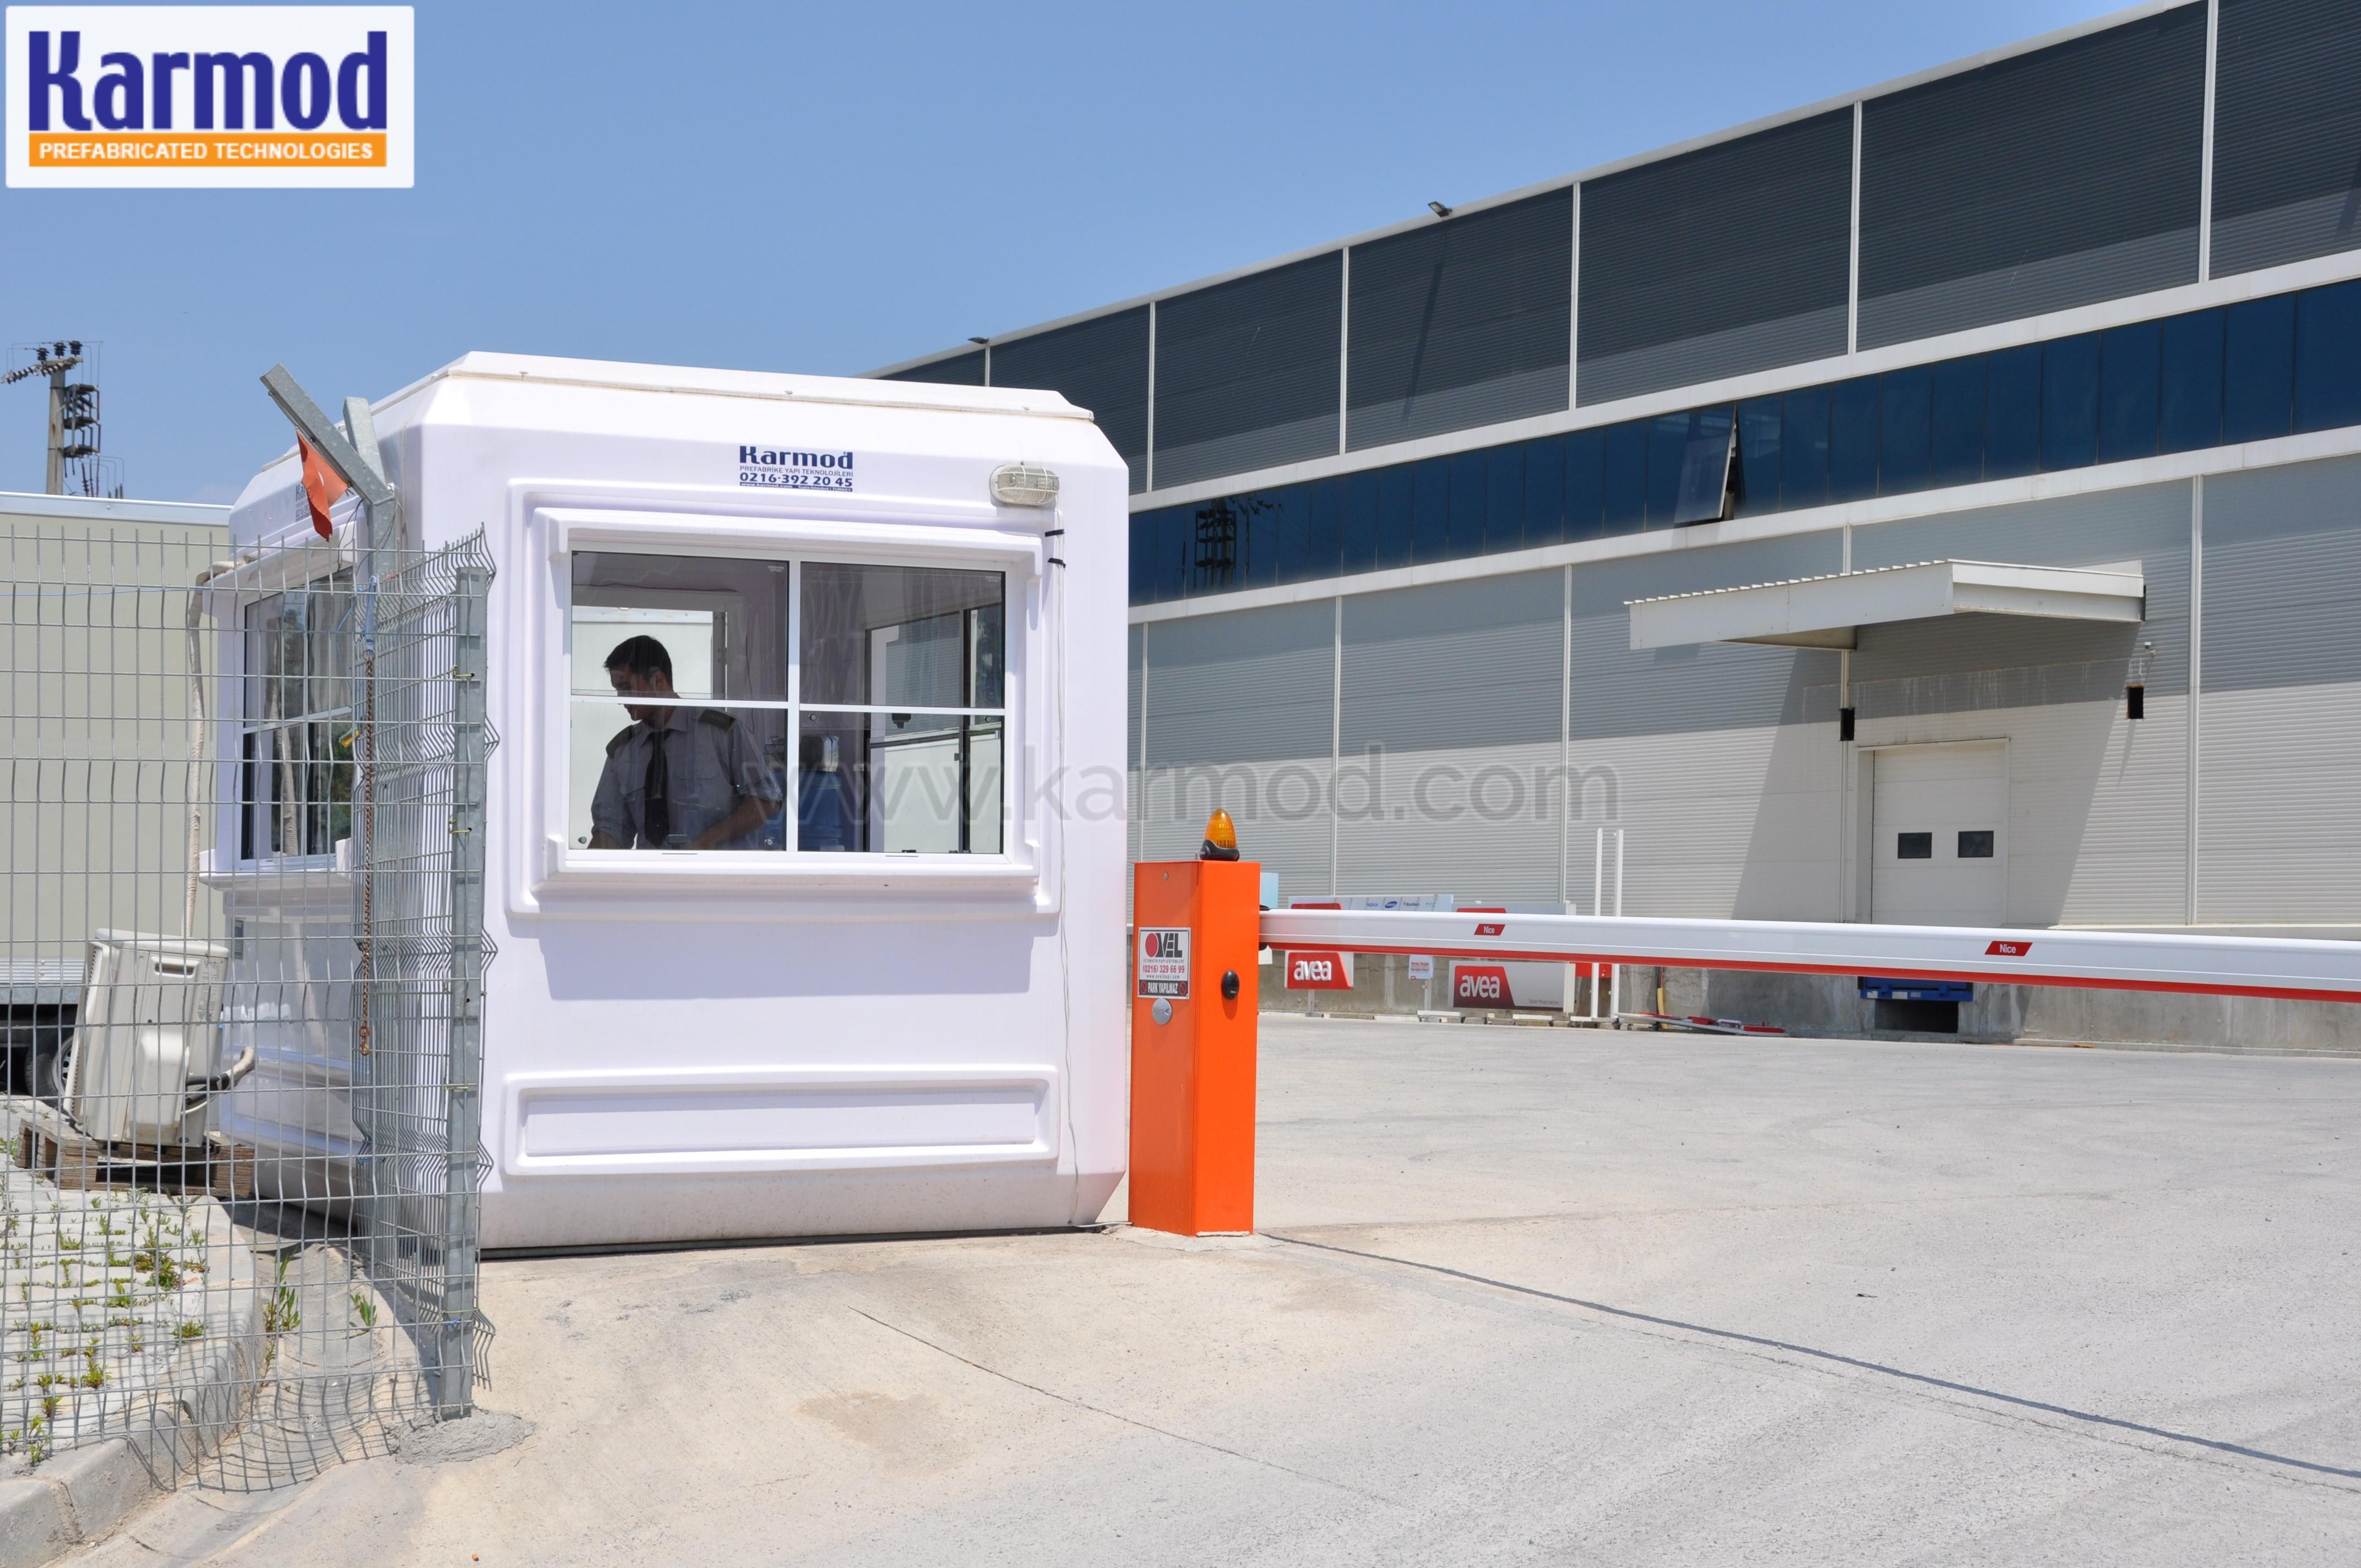 parking lot attendant booths